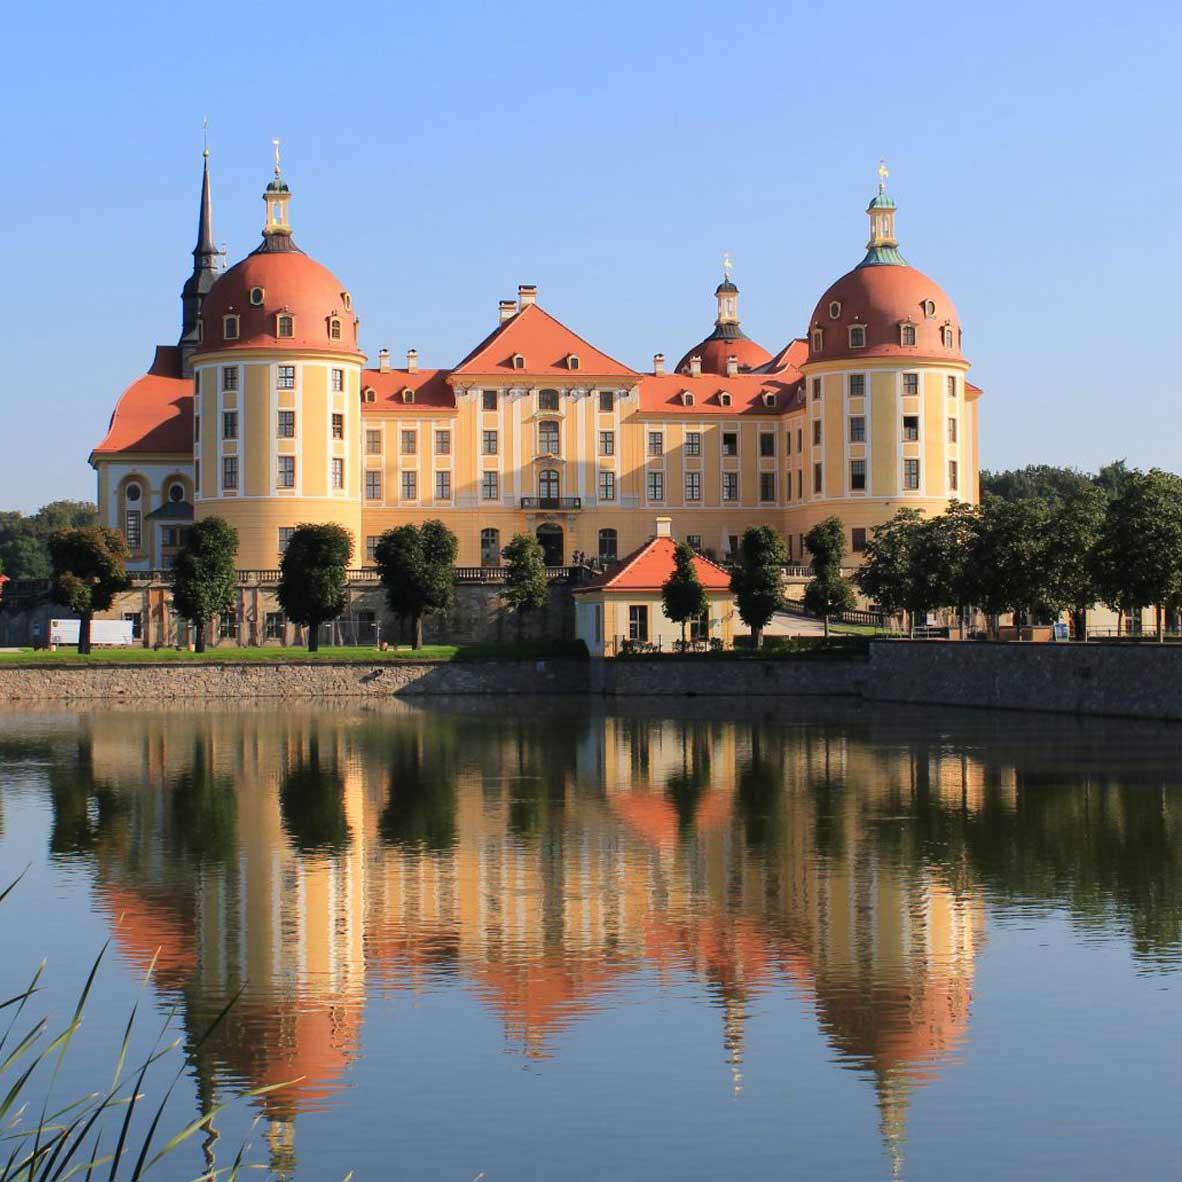 Tour 02 - Schlosspark Moritzburg